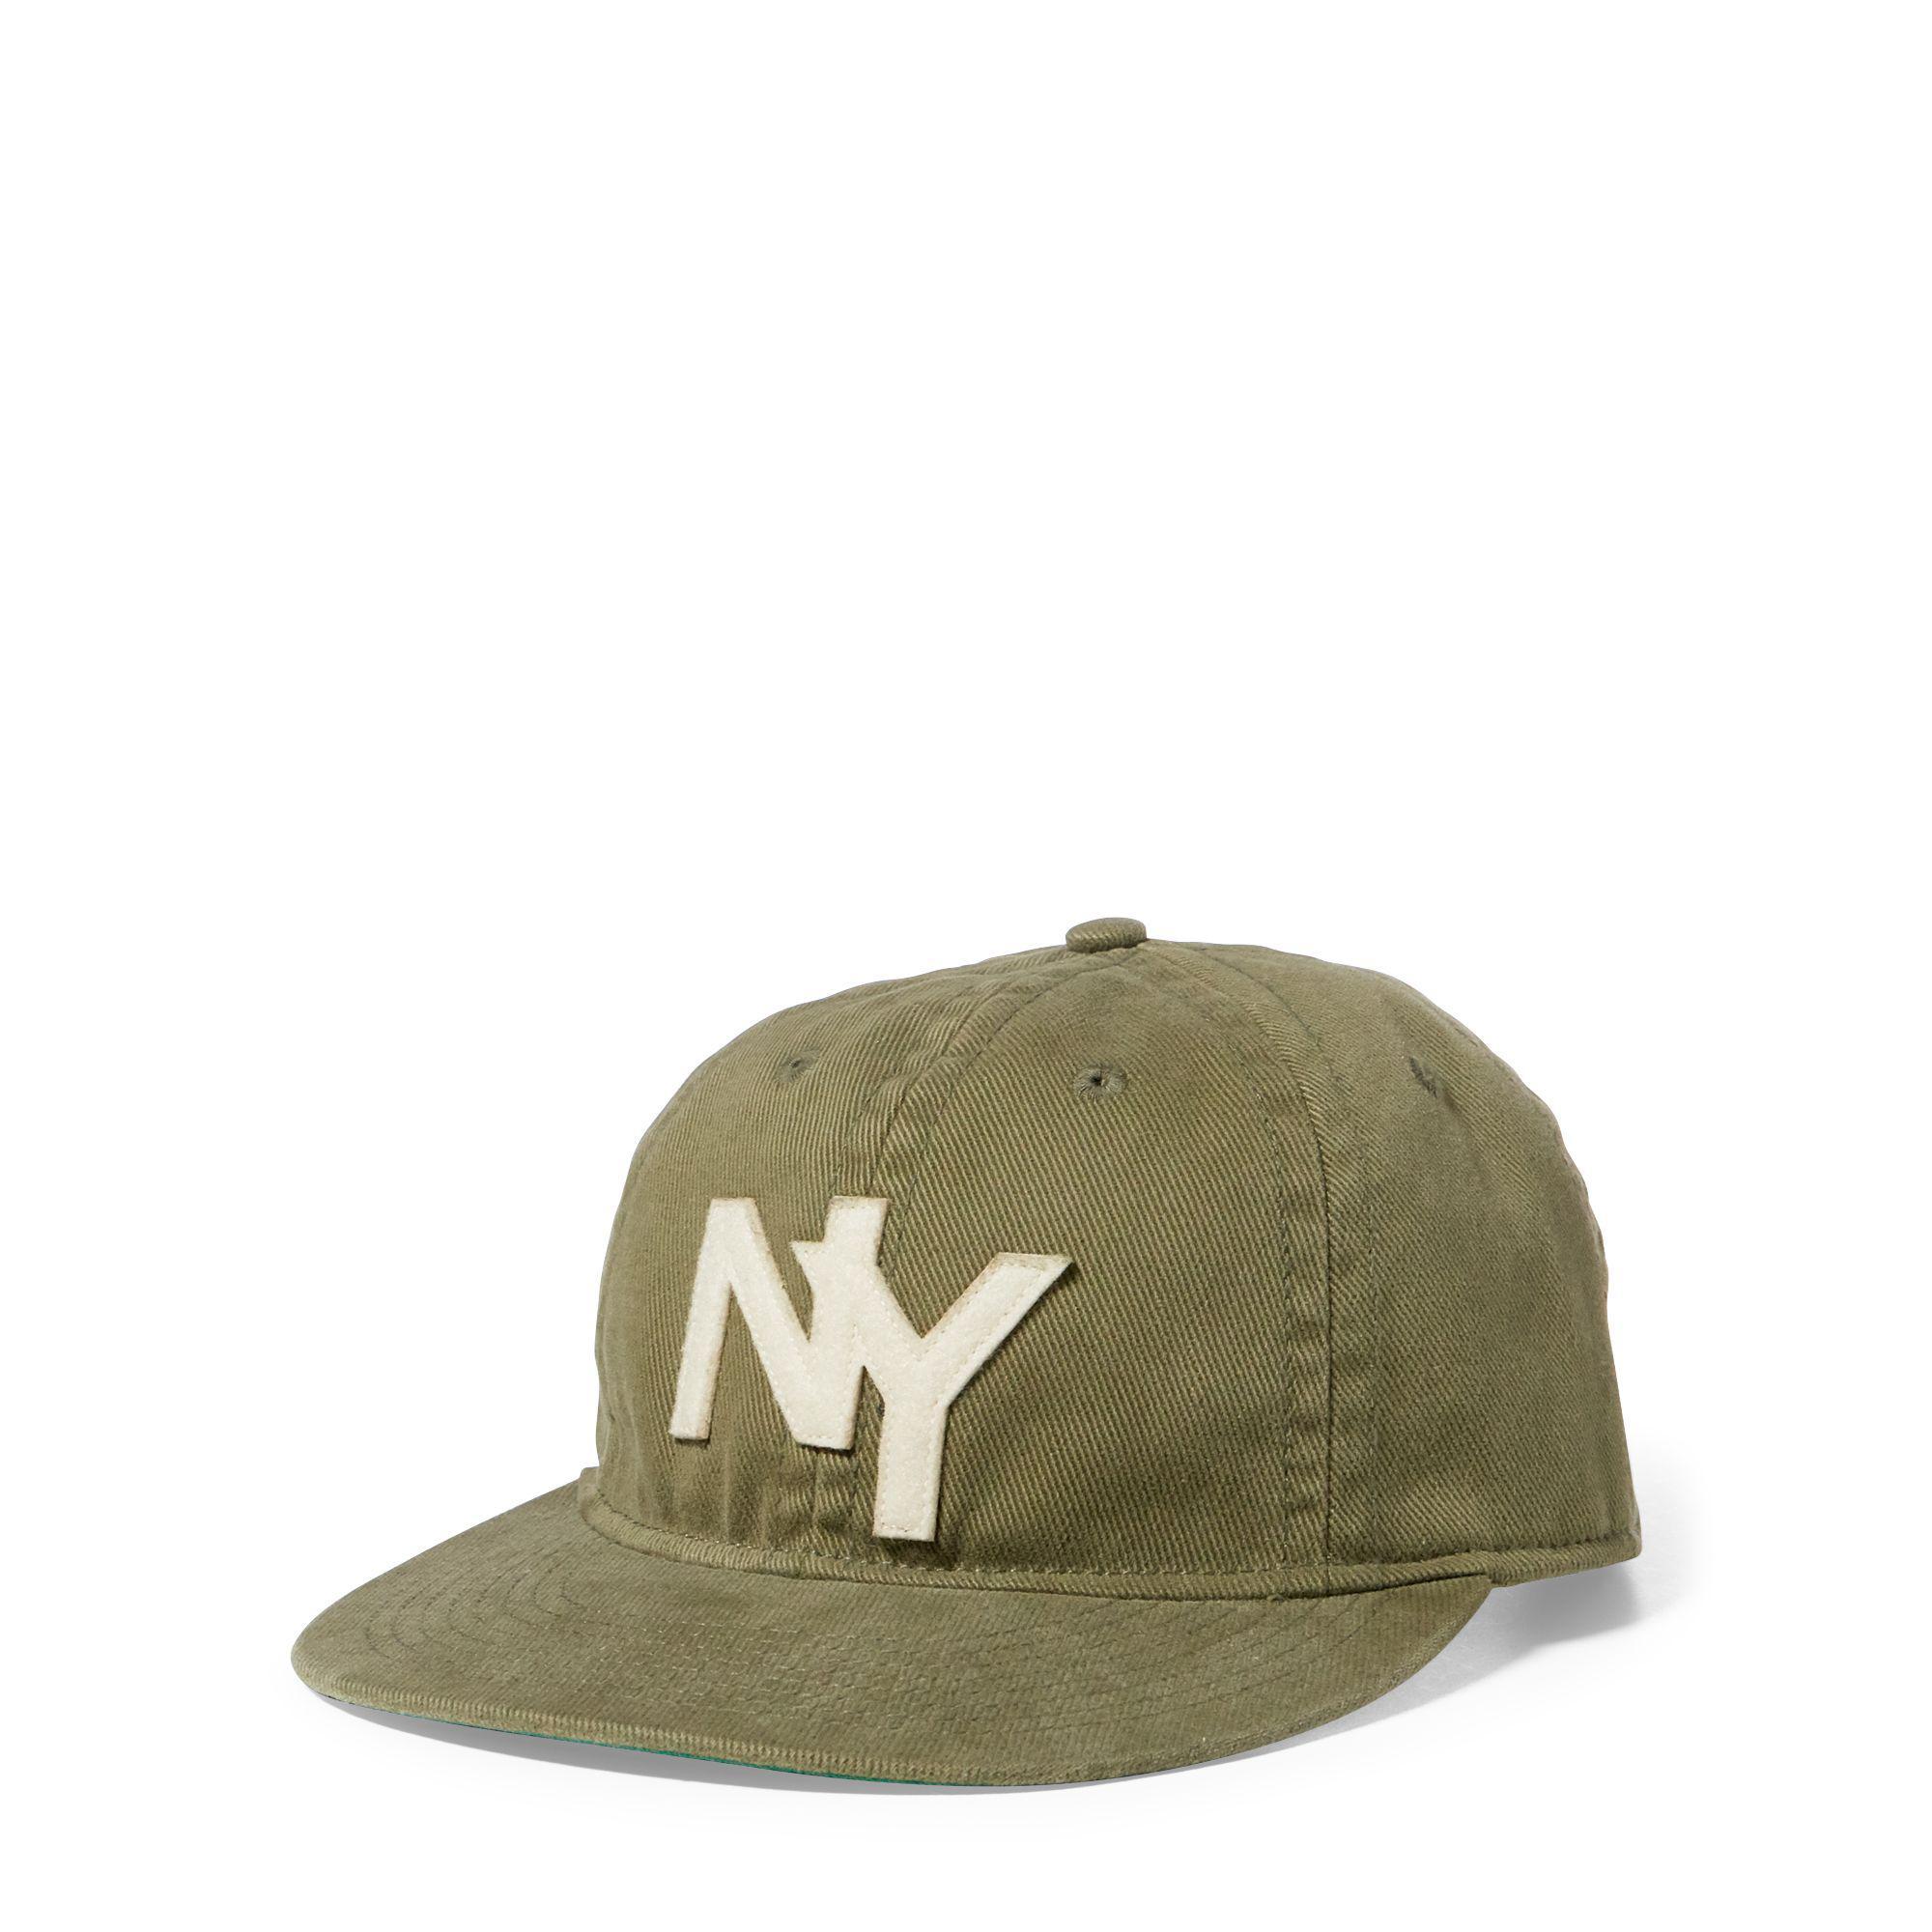 241fcdedddc01 Polo Ralph Lauren Cotton Baseball Cap in Green for Men - Lyst